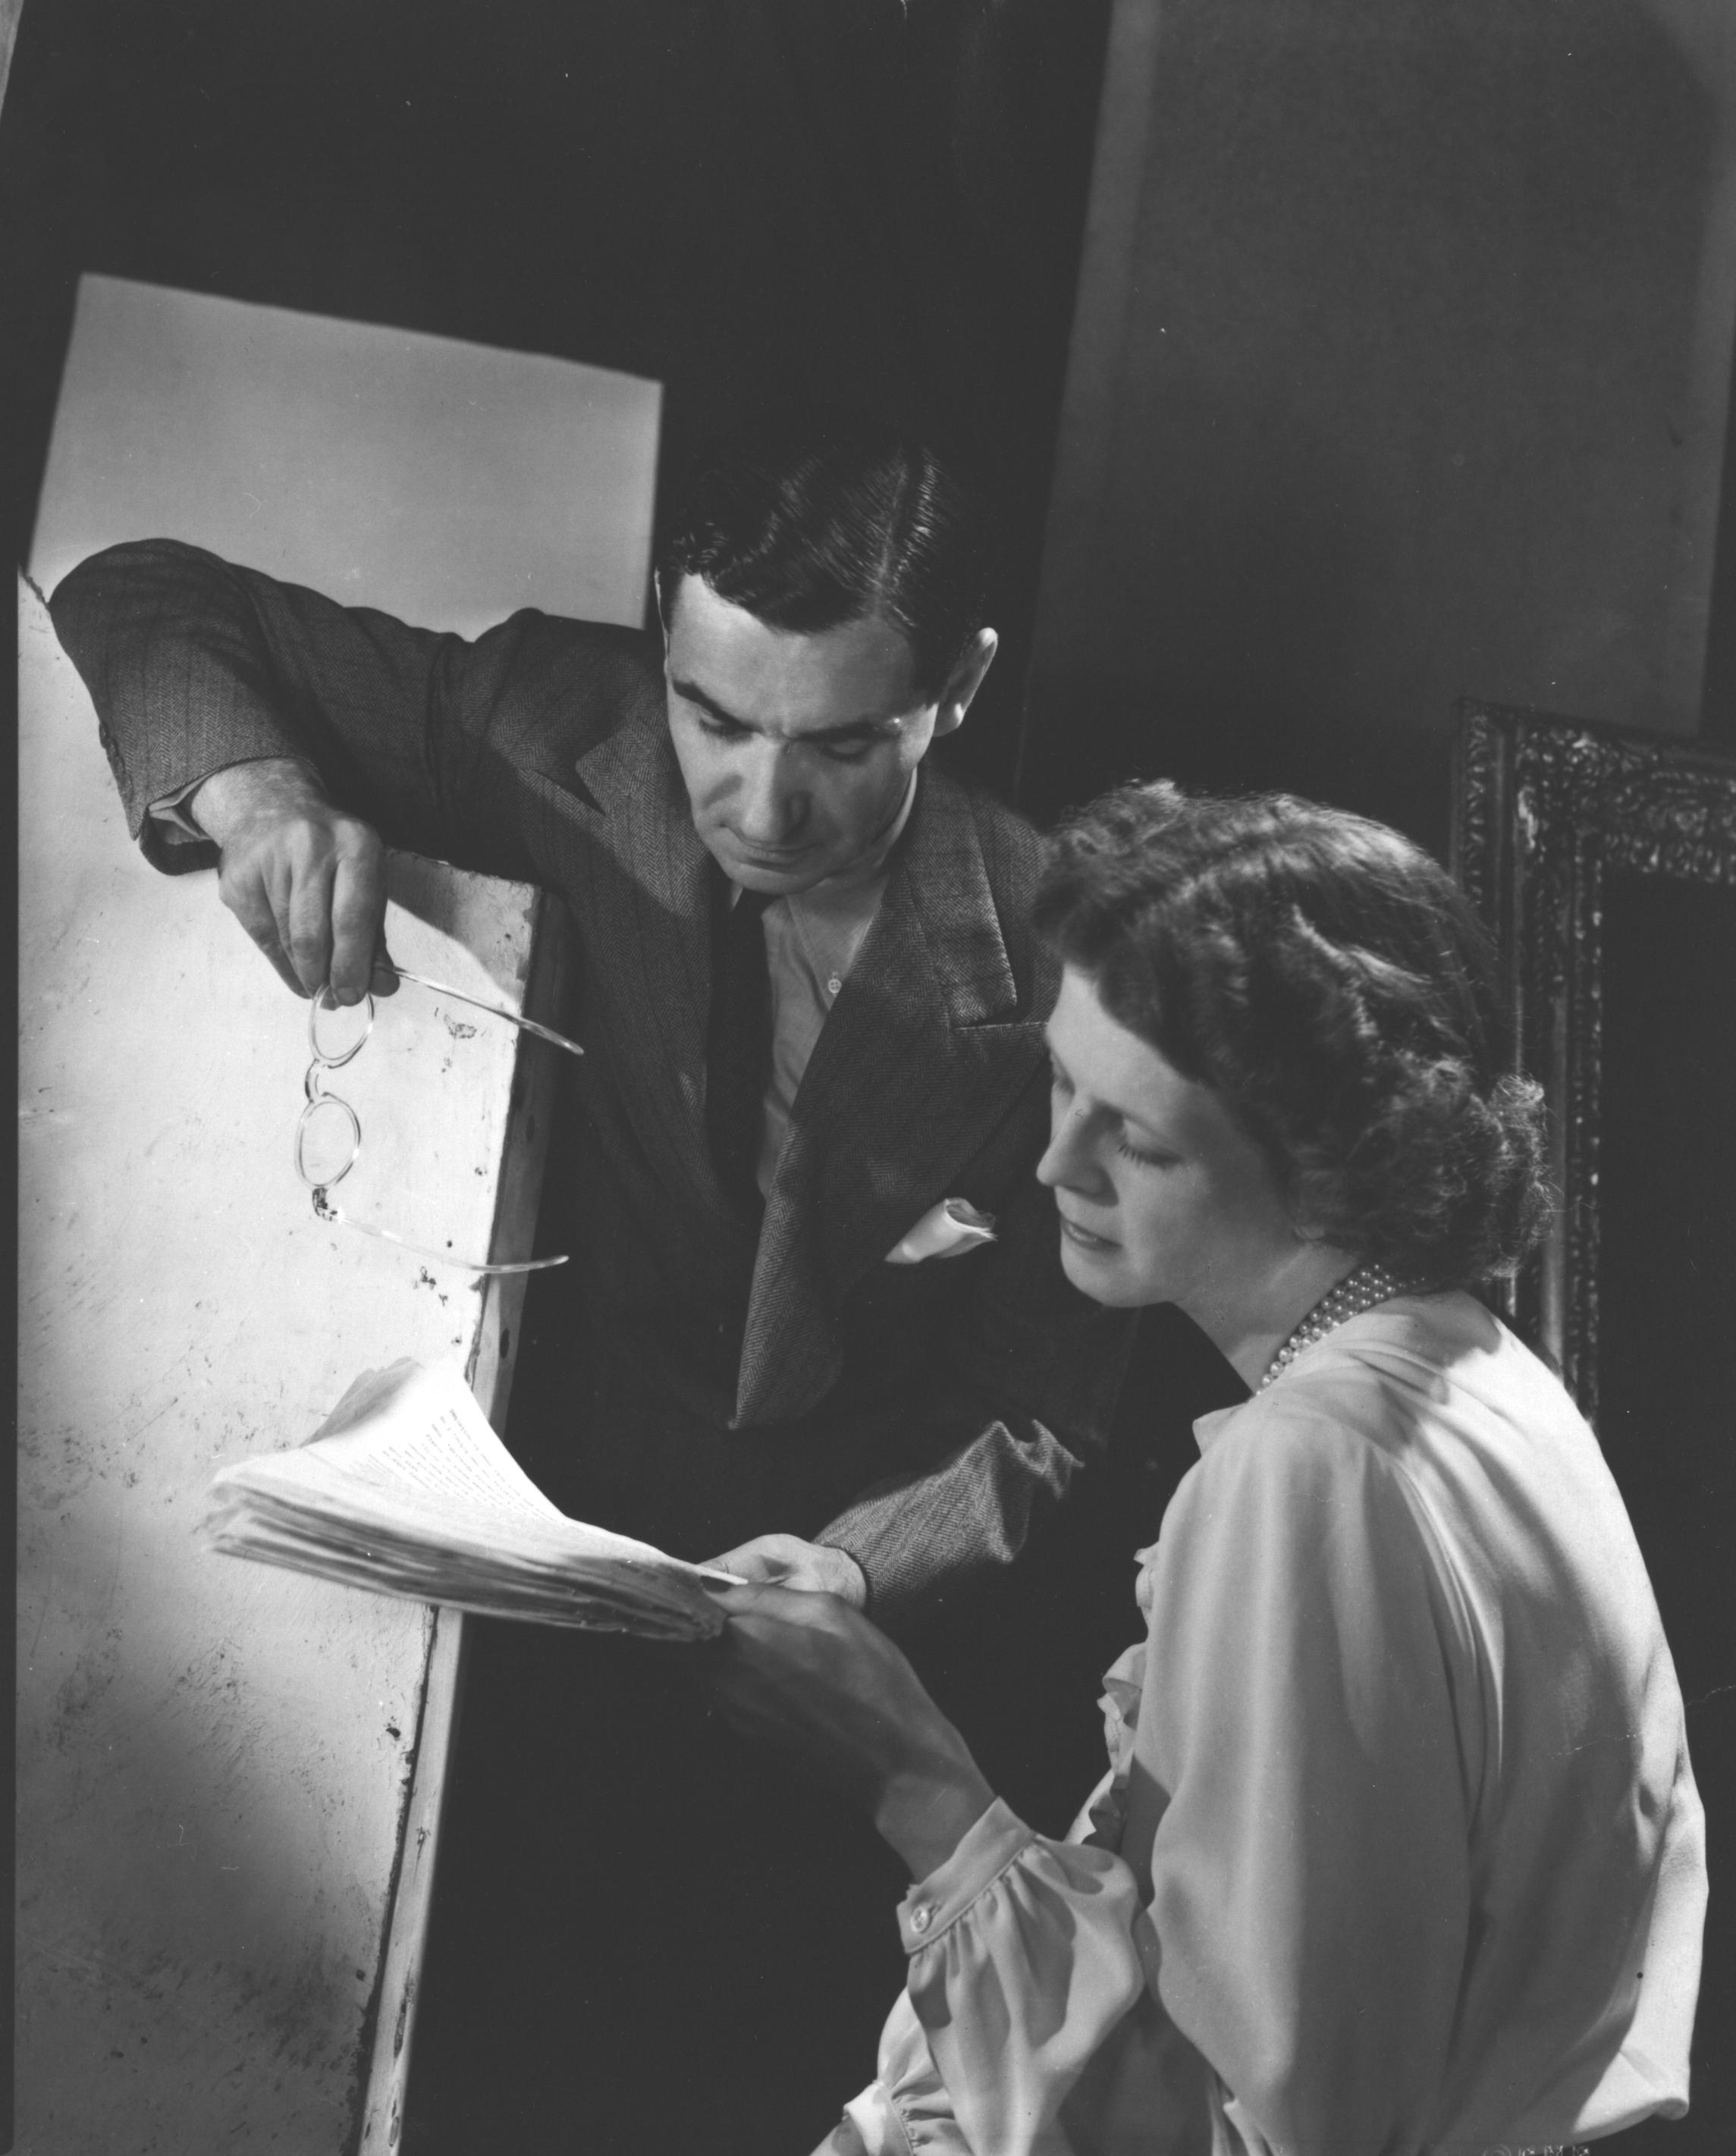 Irving Berlin and his wife Ellin Mackay